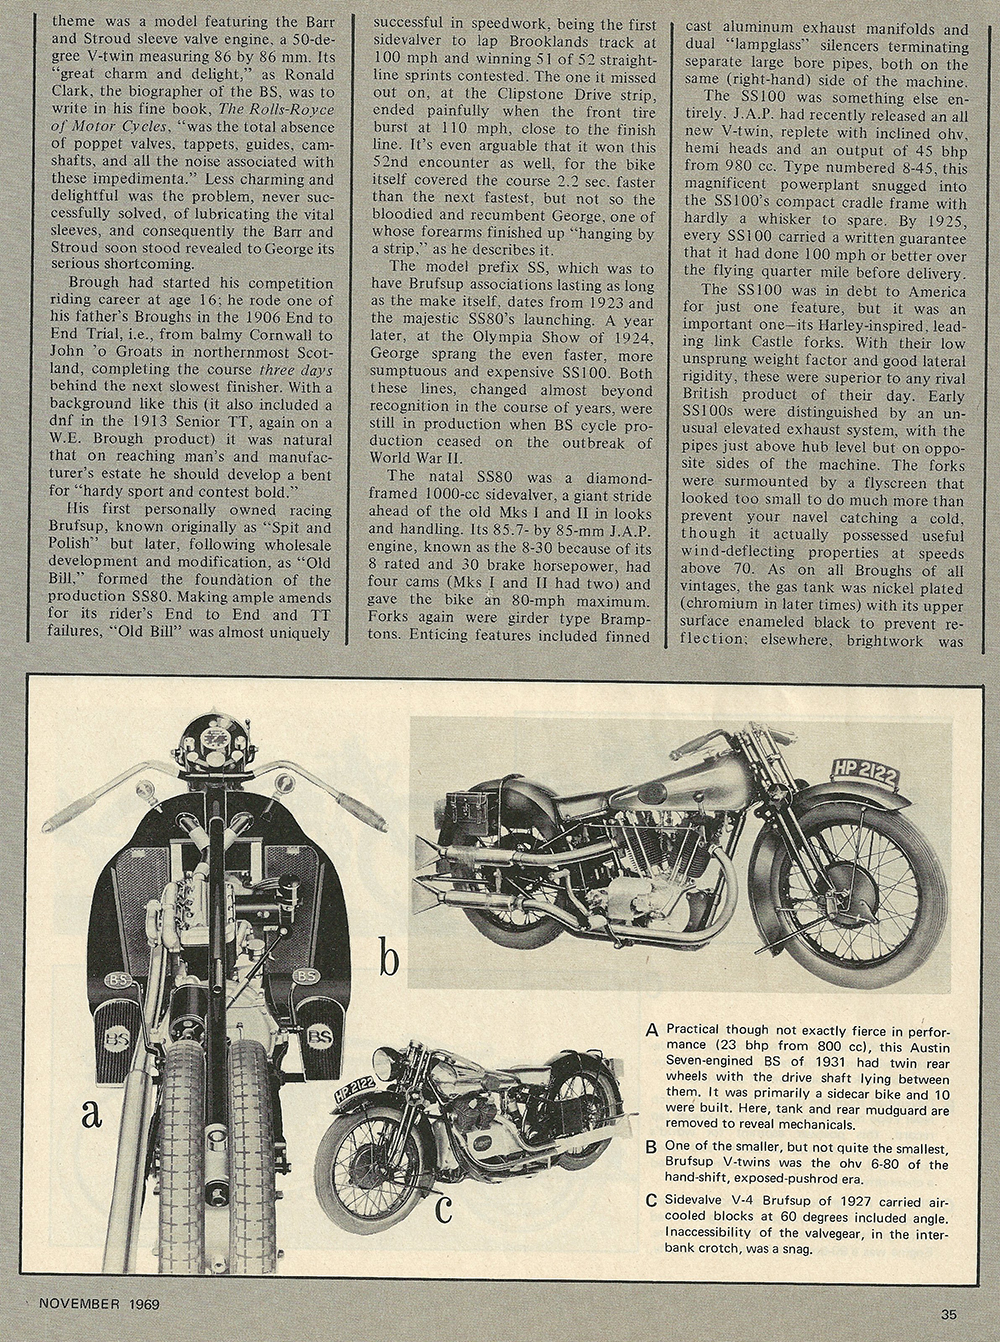 History of Brough Superior 03.jpg